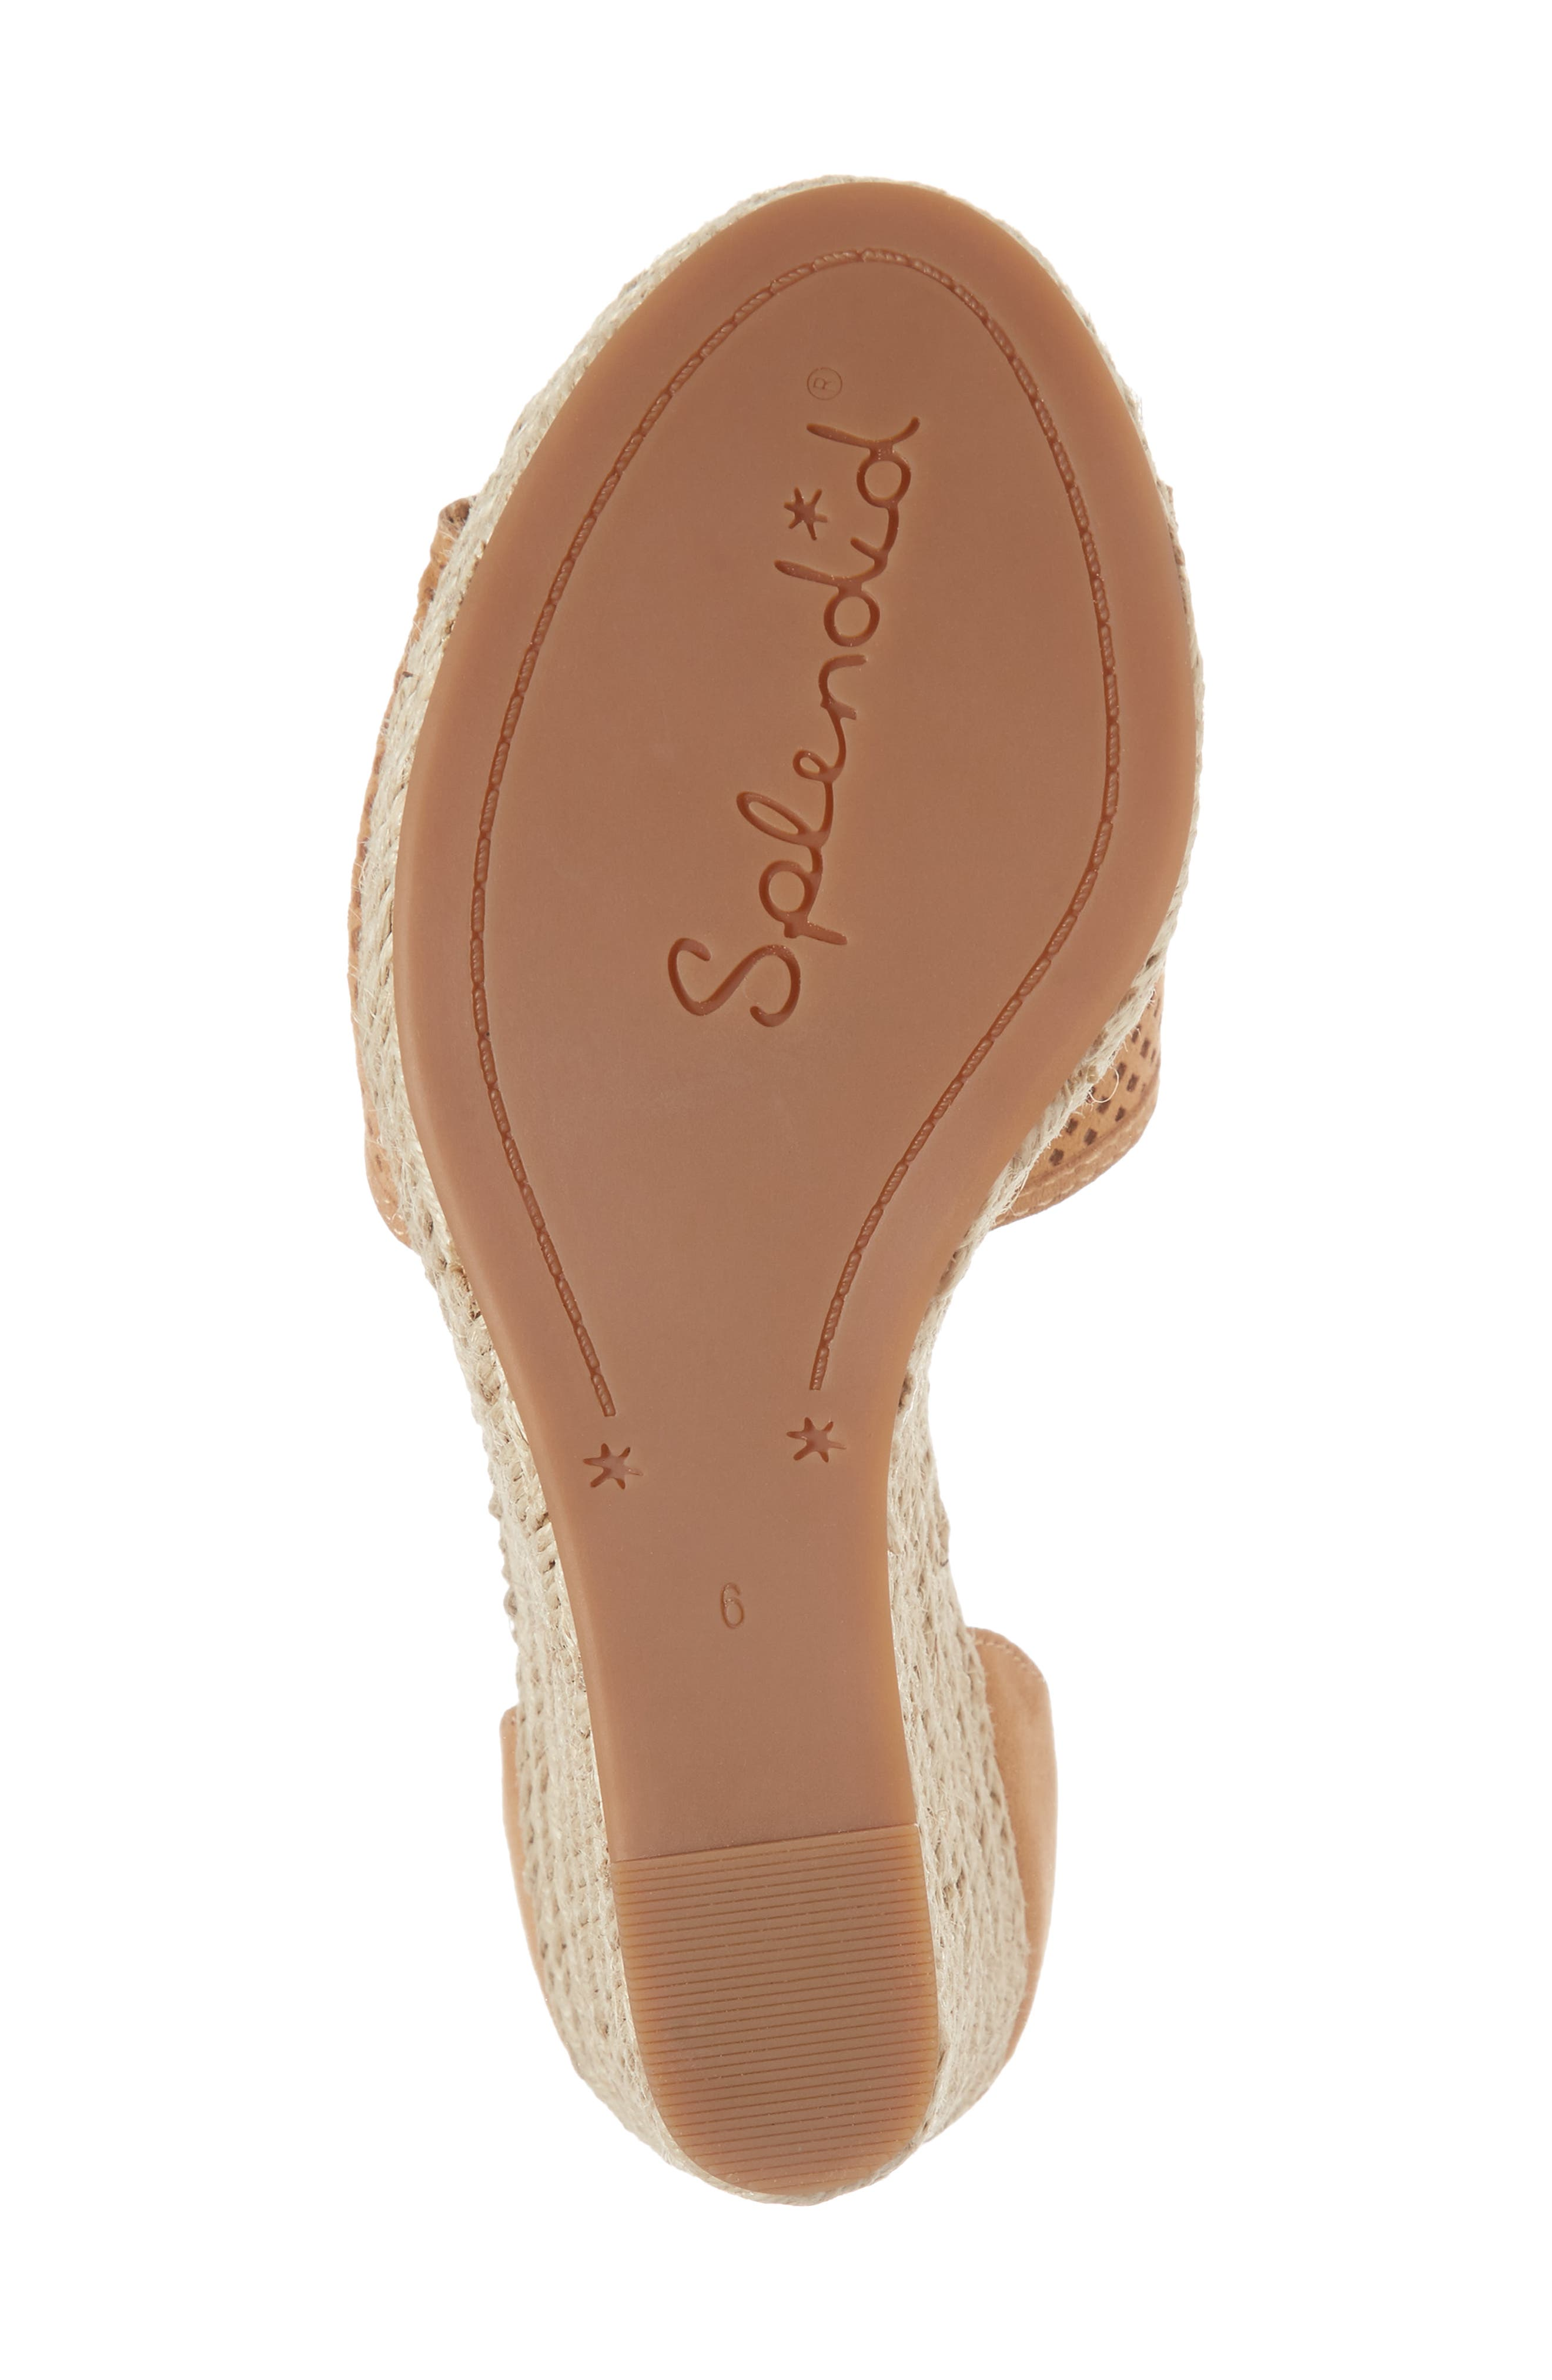 Bentley Espadrille Wedge Sandal,                             Alternate thumbnail 6, color,                             Tan Suede